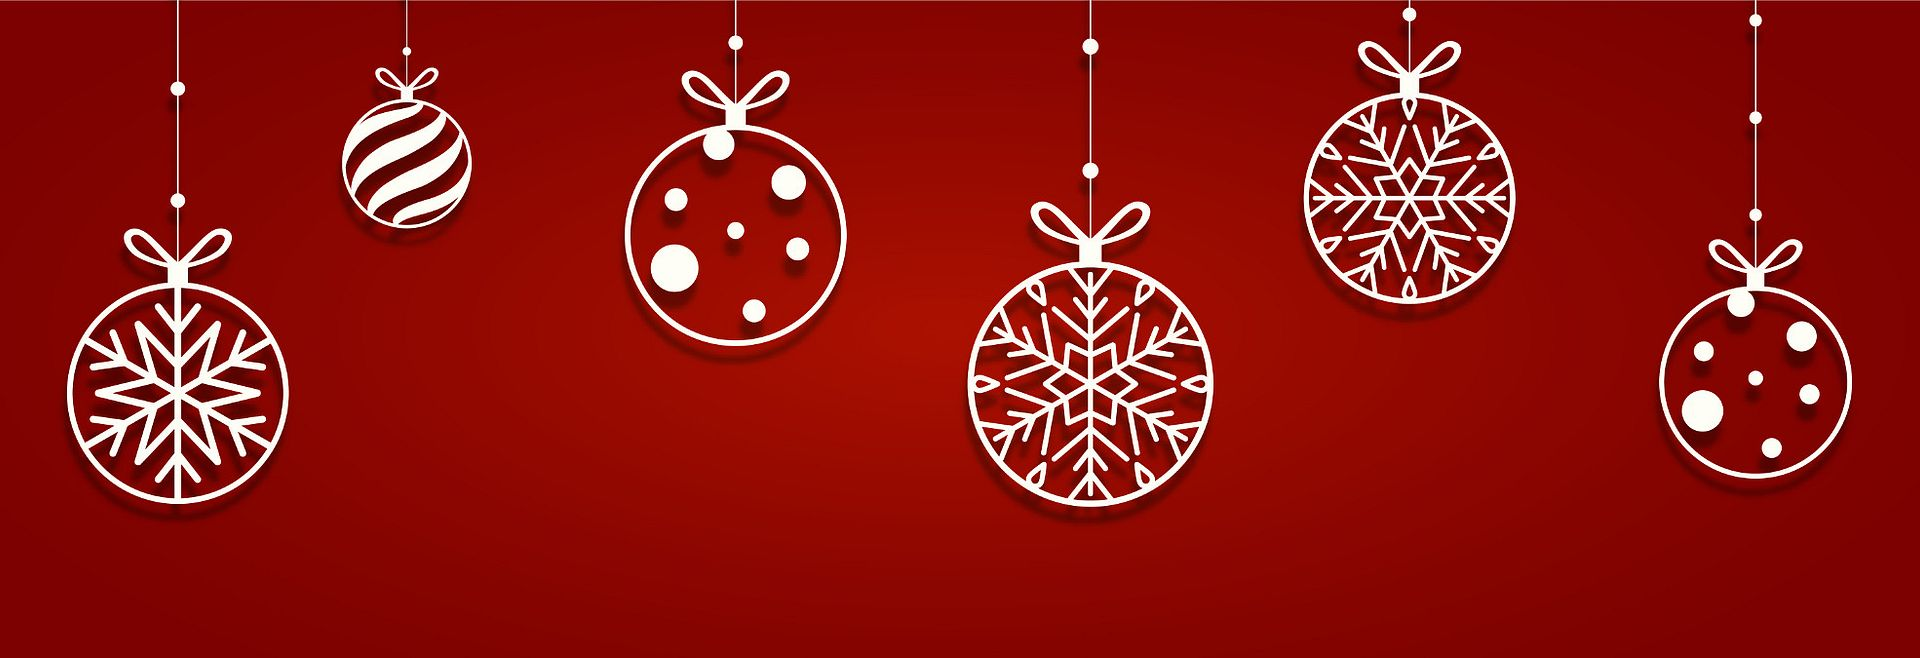 Holiday Ornaments hanging